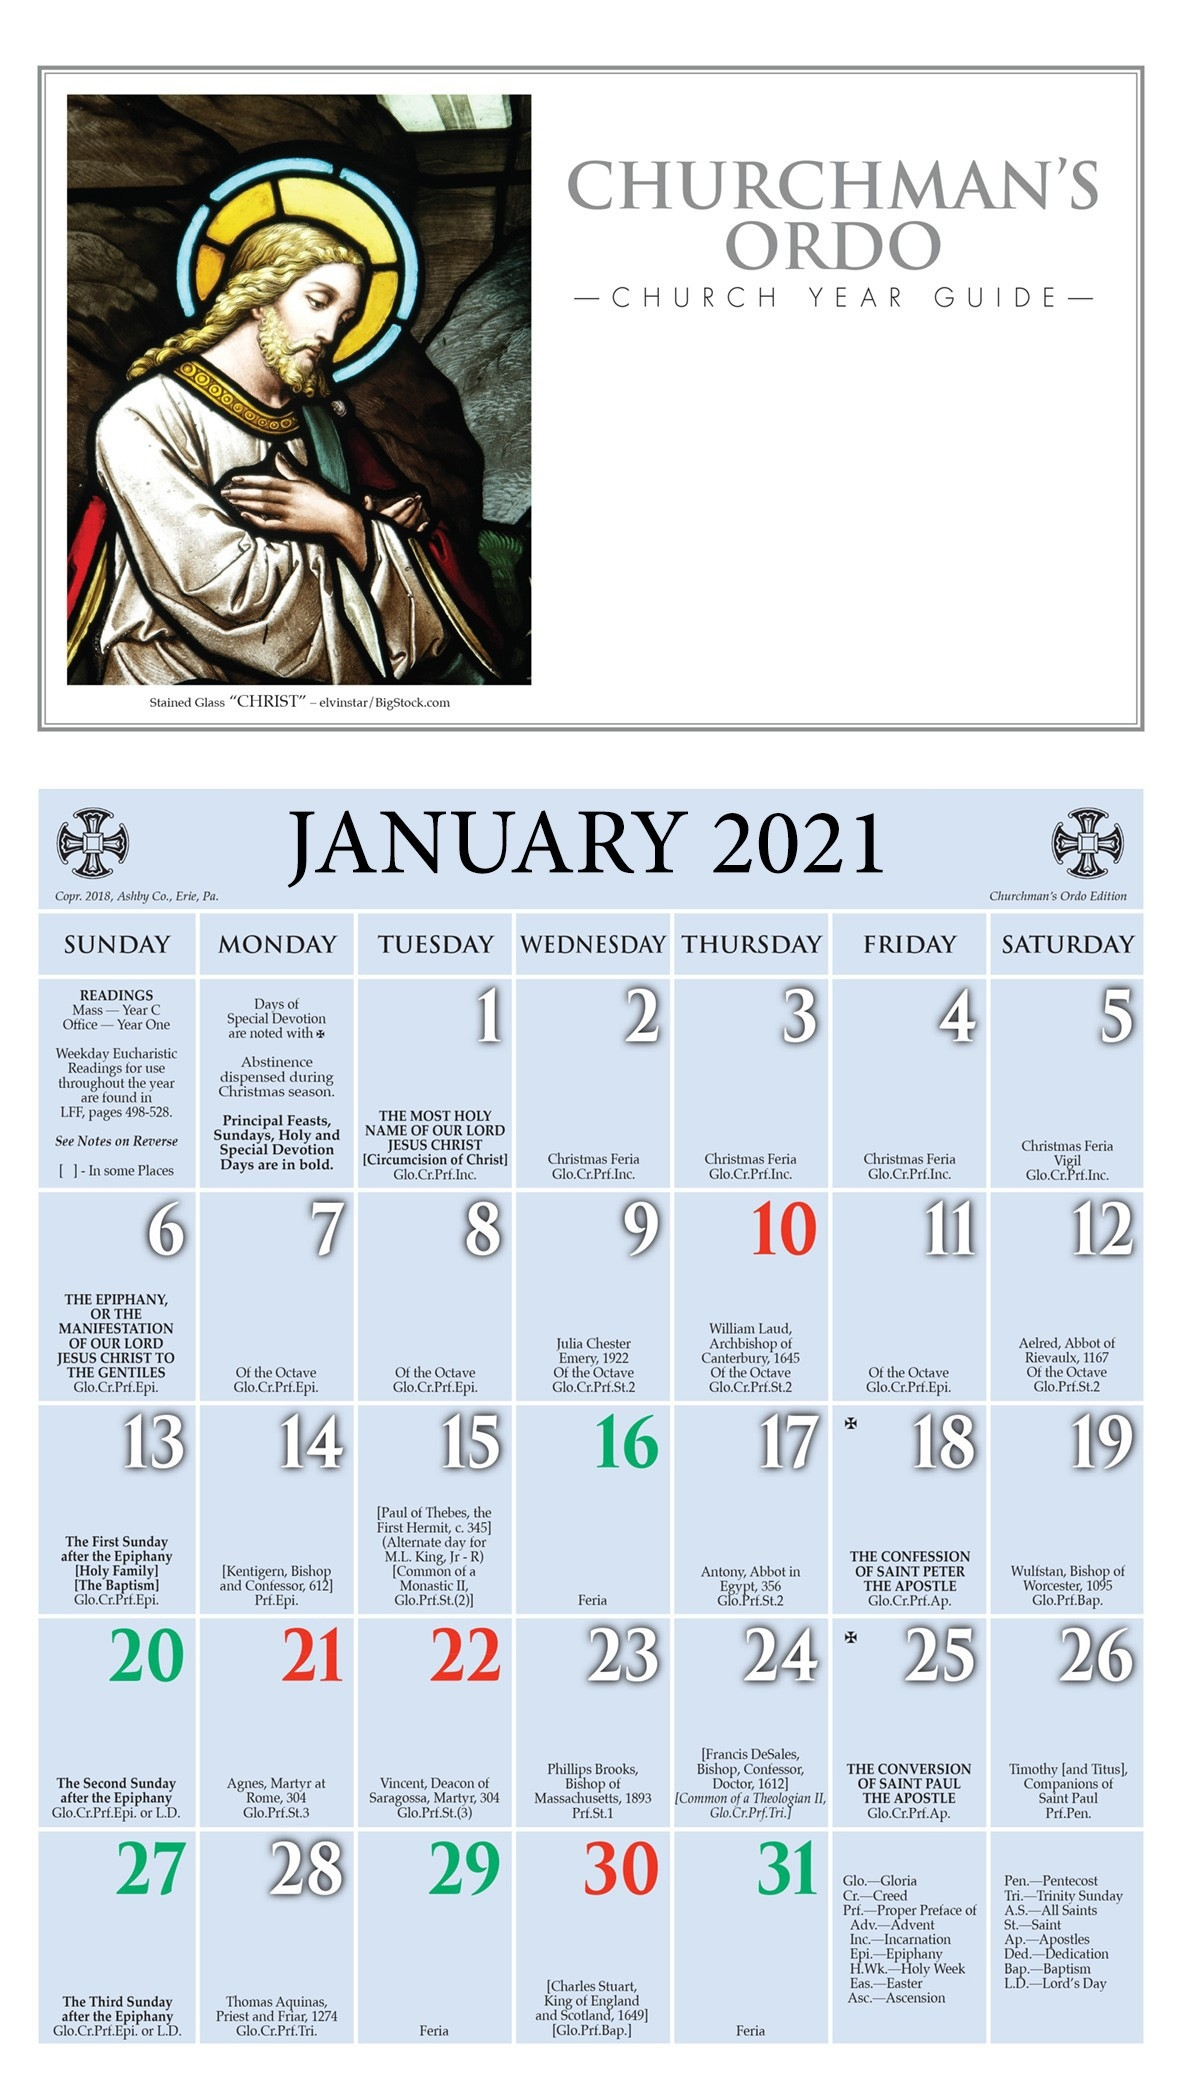 Churchpublishing: Churchman'S Ordo Kalendar 2021  Common Lectionary 2021